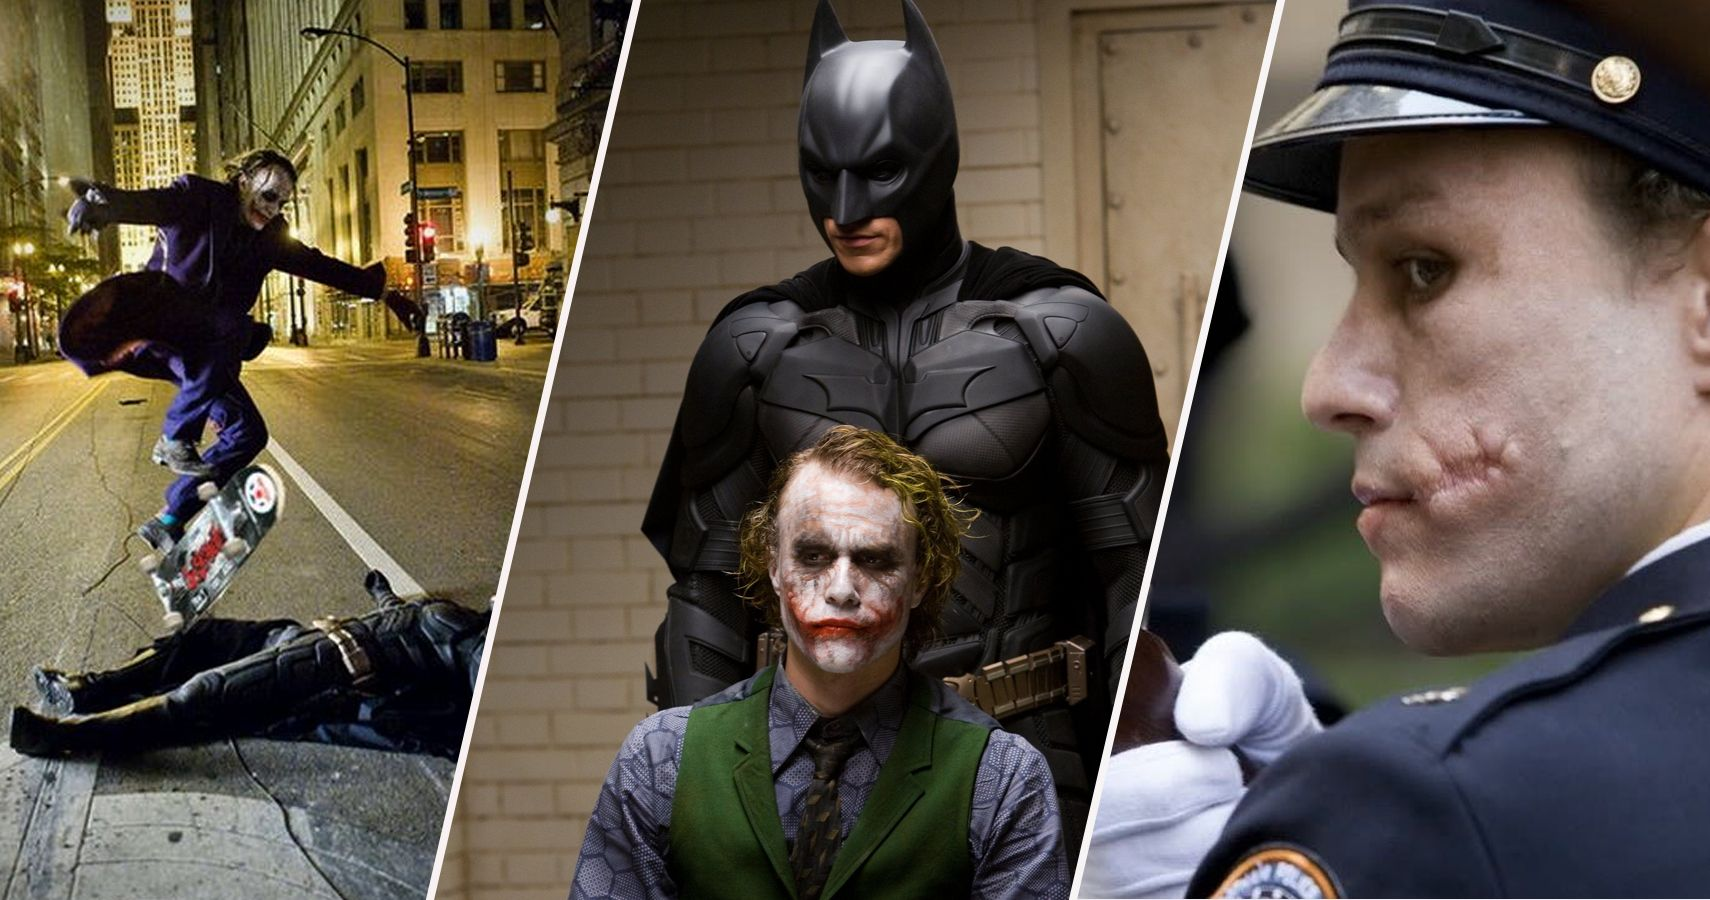 25 Details About Heath Ledger's Joker That Fans Choose To Ignore